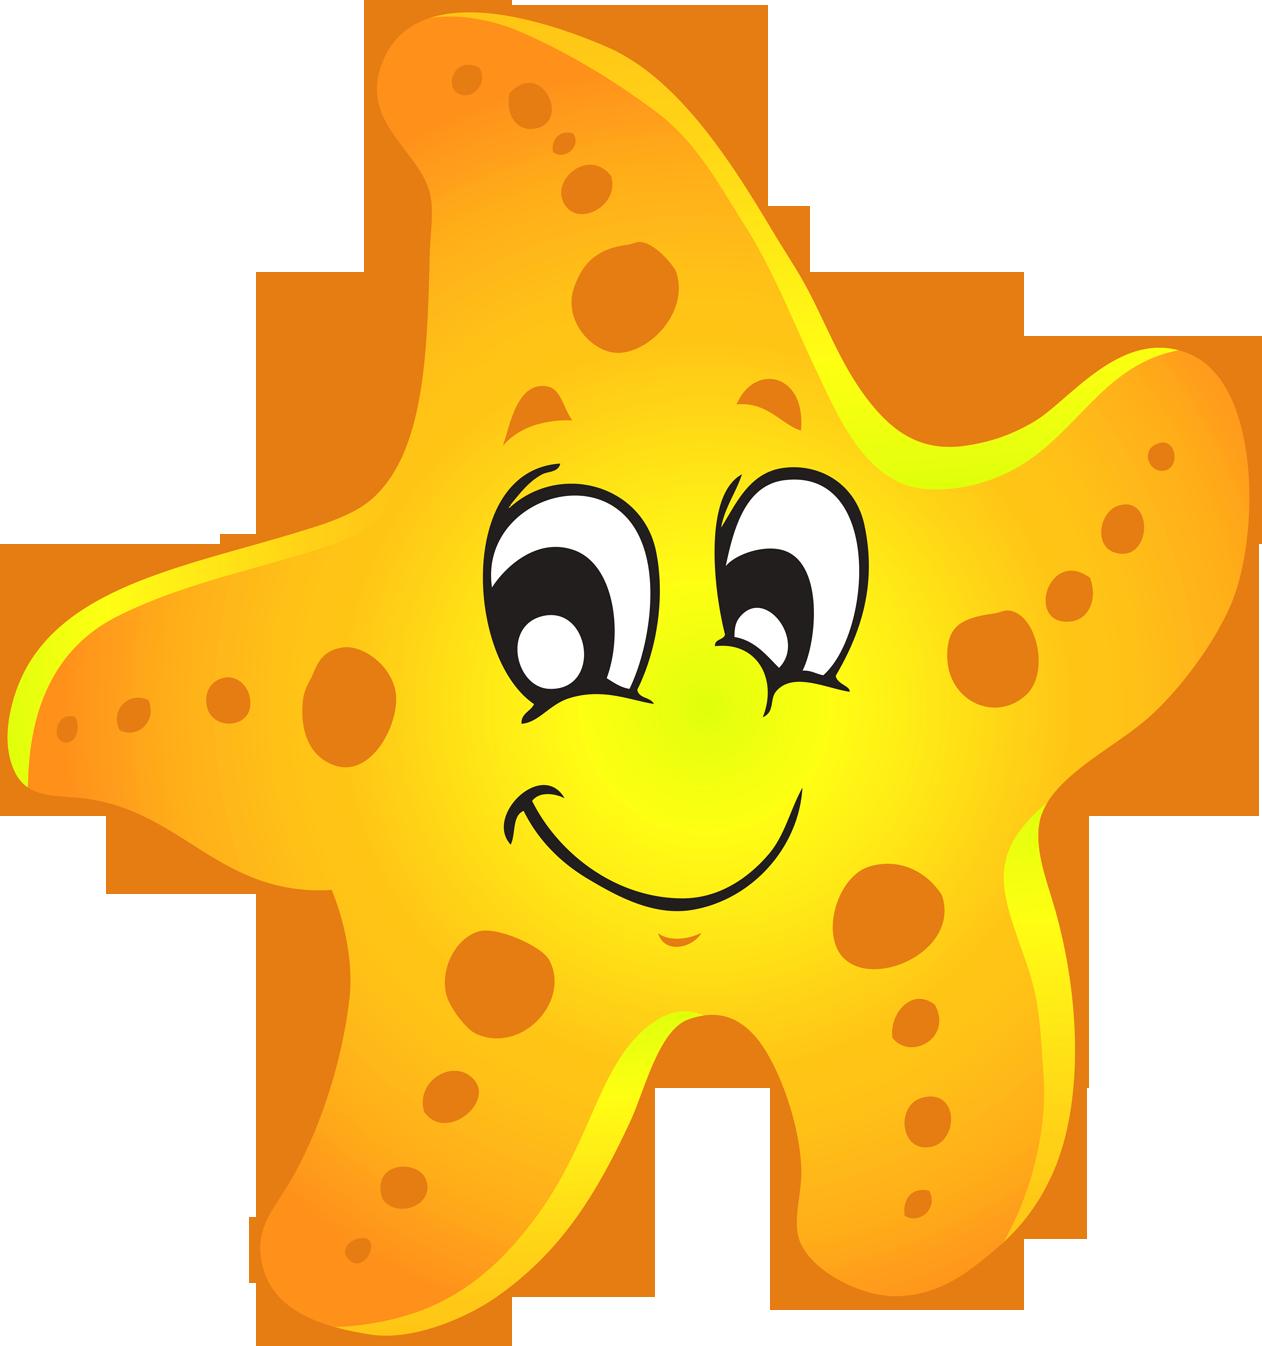 Starfish Cute Of A Sea Star Clipart-Starfish cute of a sea star clipart-7